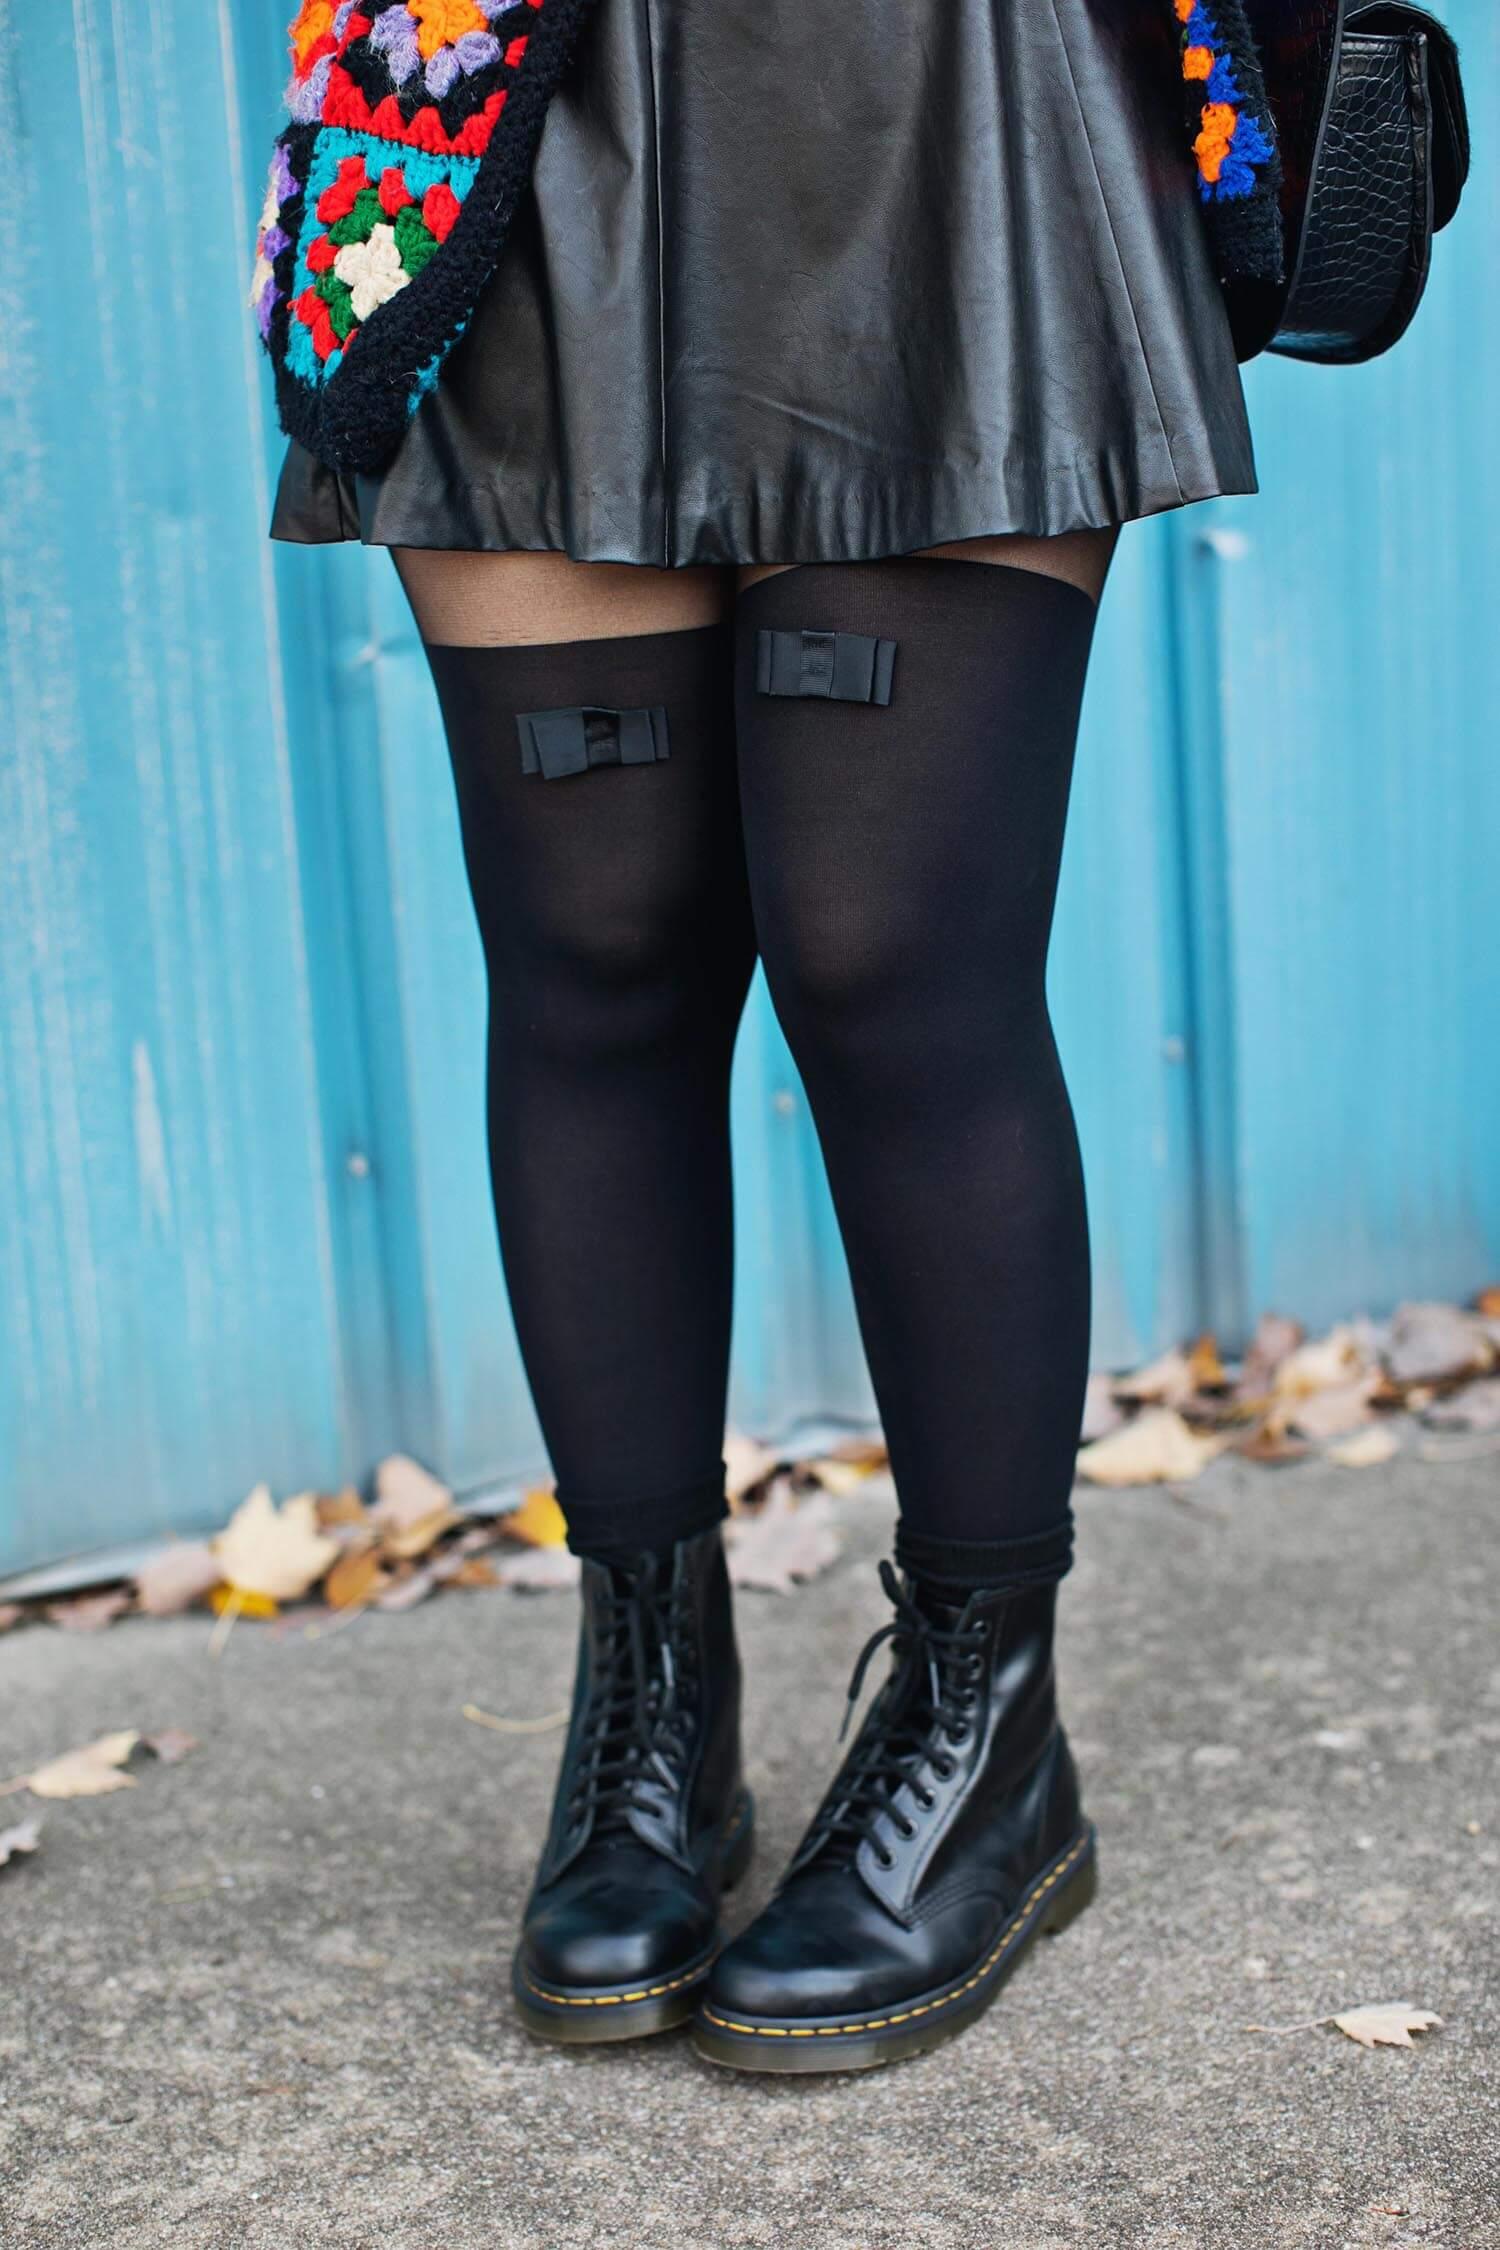 Bow tights